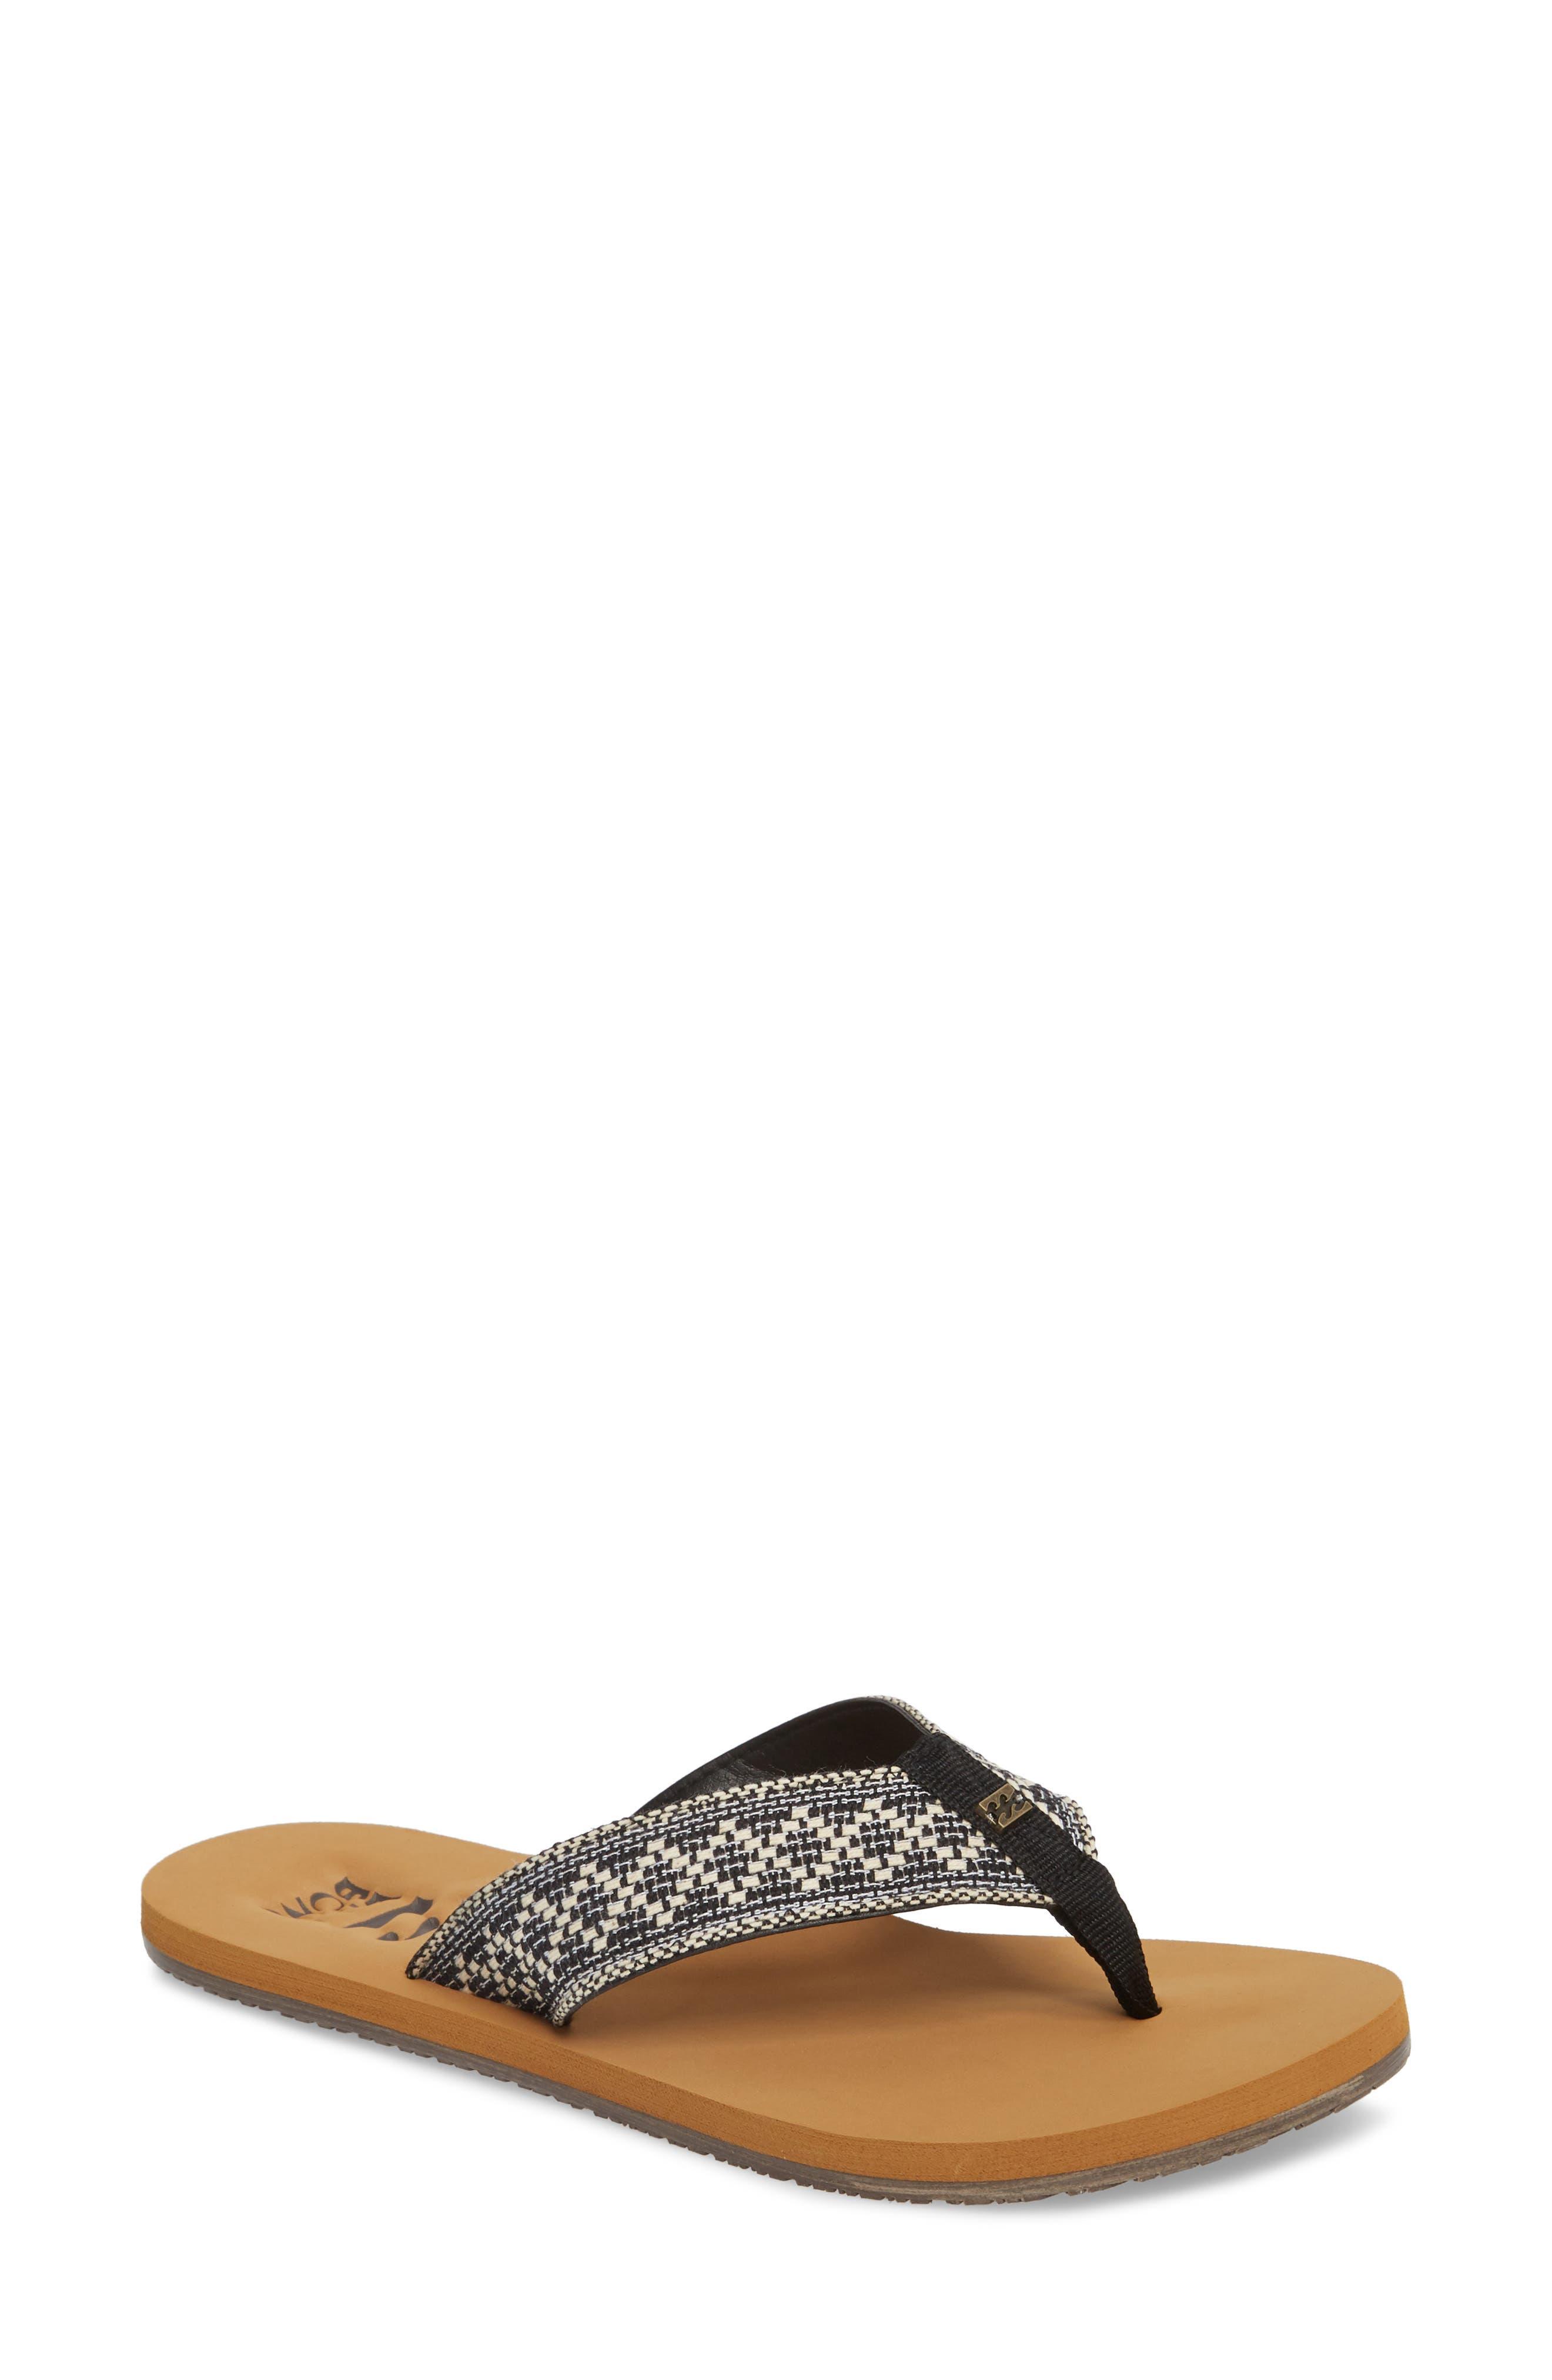 Baja Flip Flop,                             Main thumbnail 1, color,                             Cool Grey